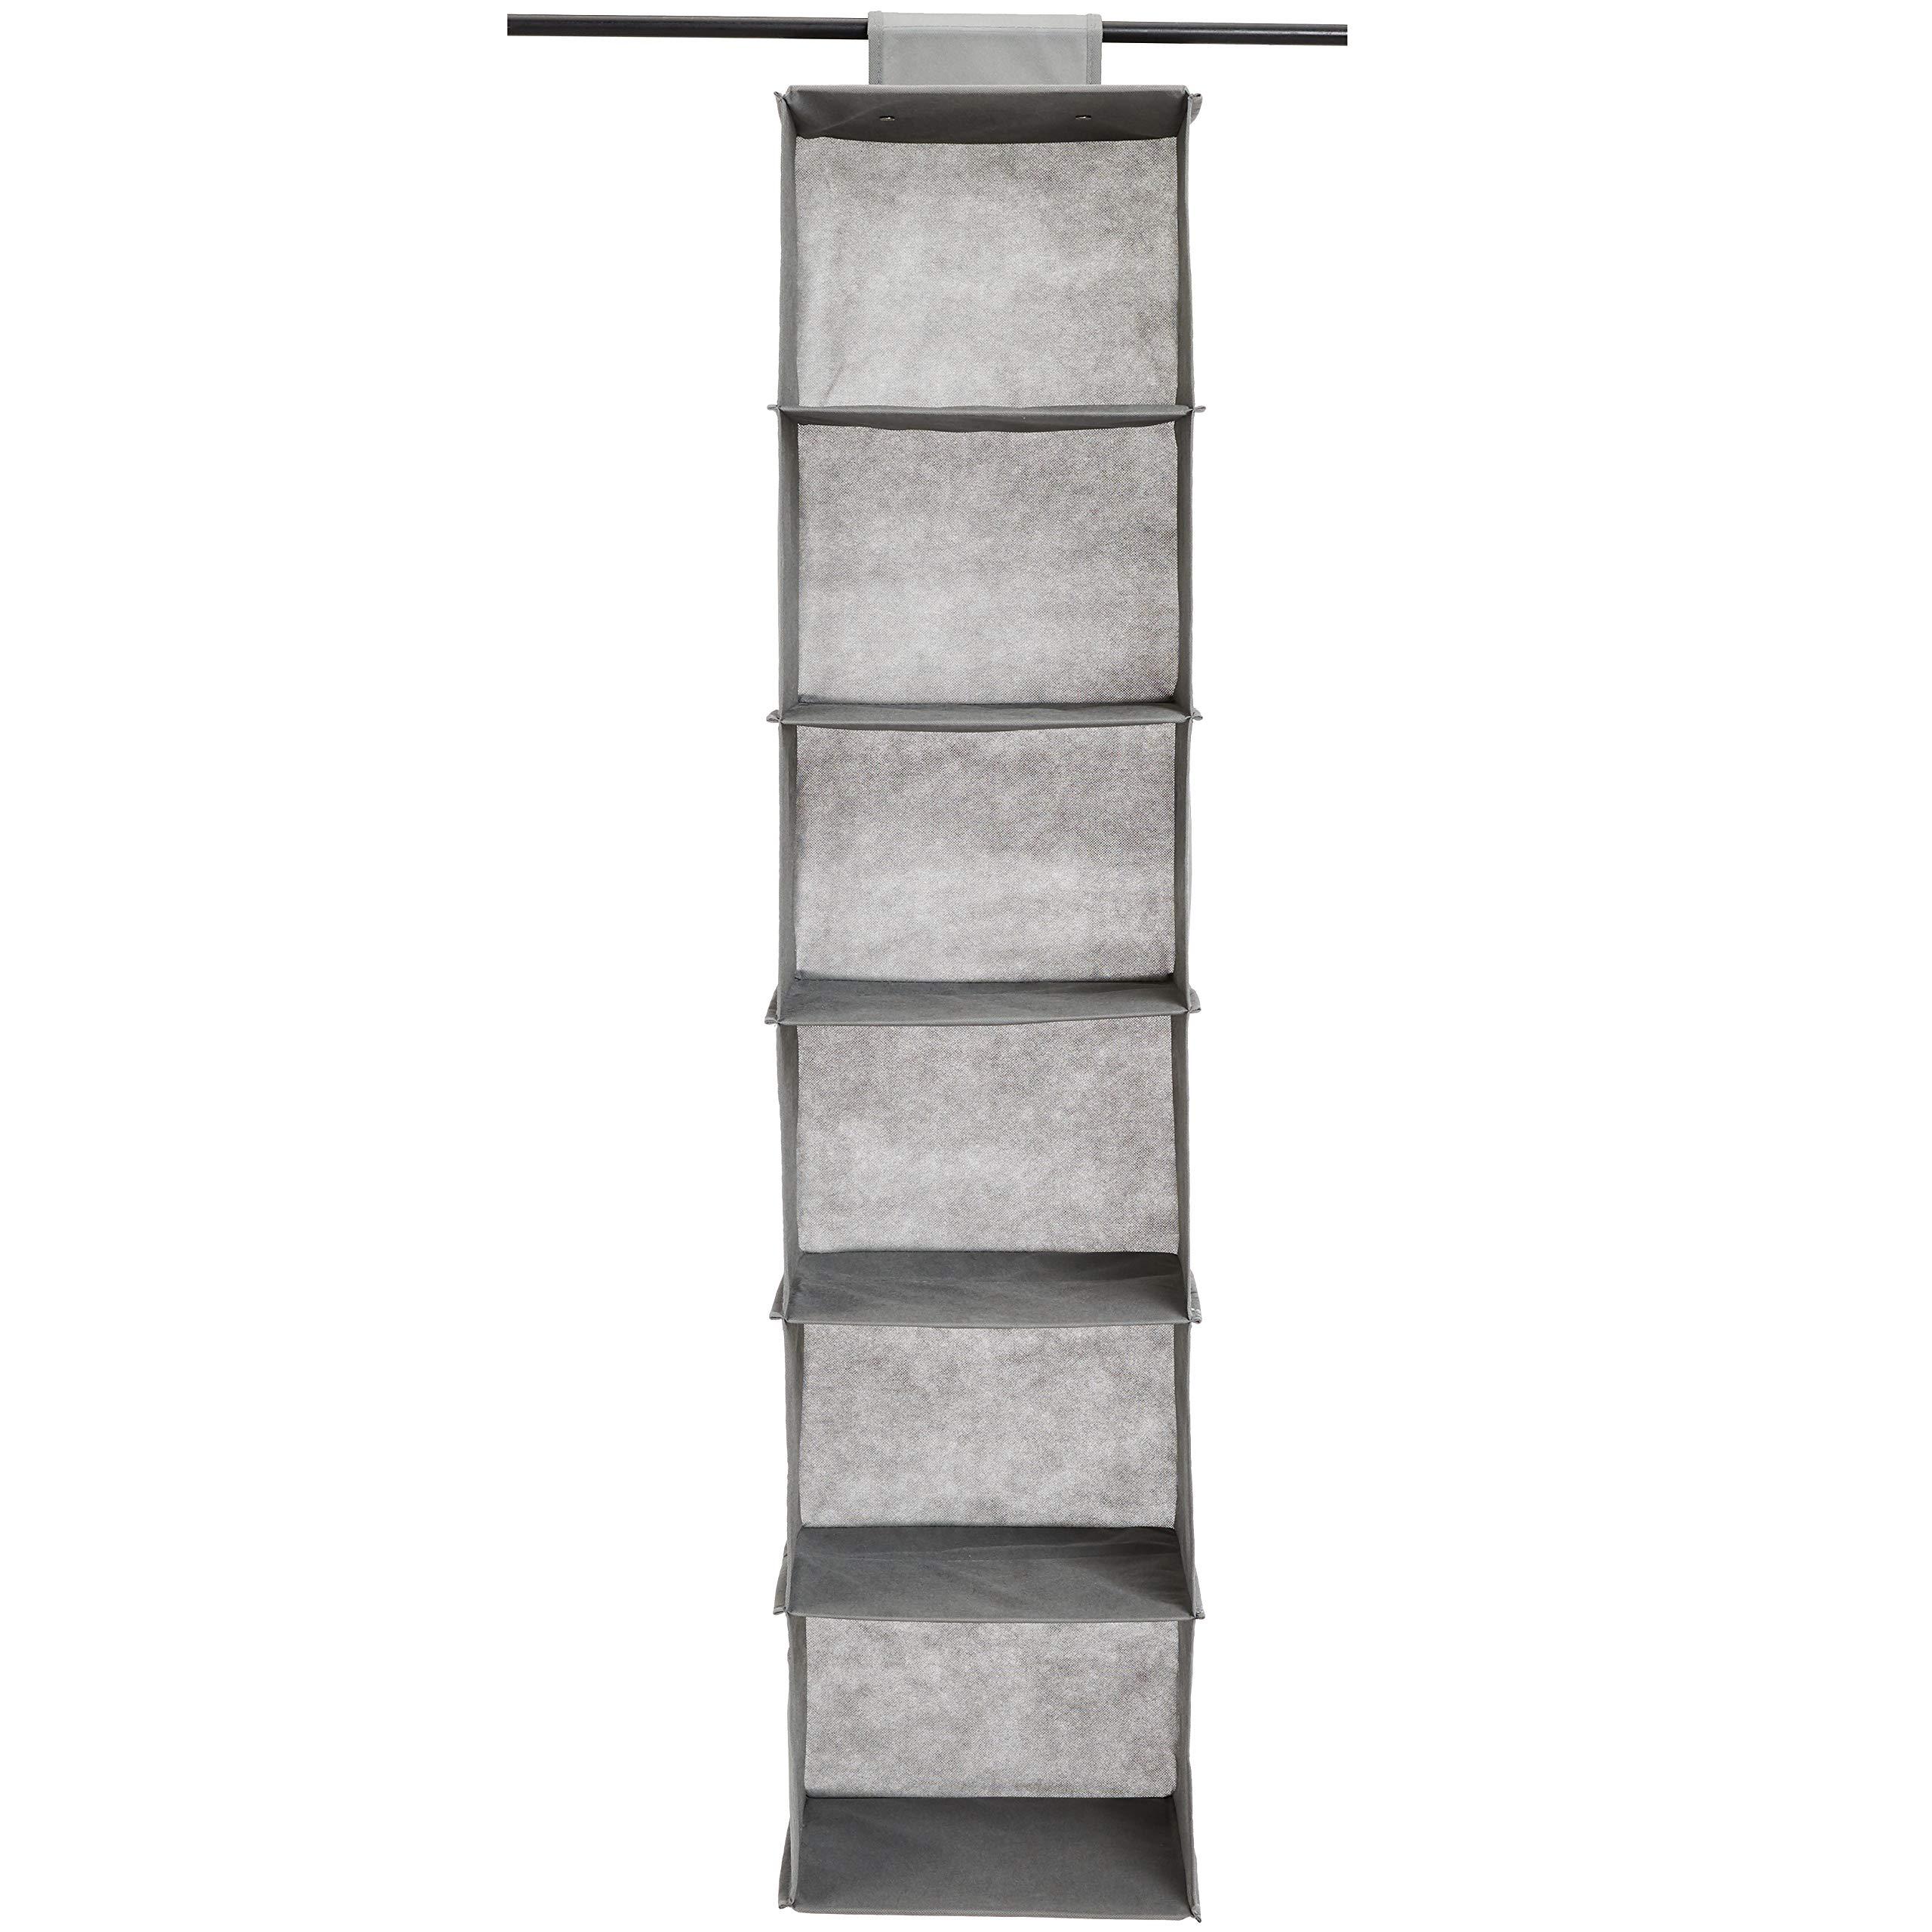 Amazon Basics Hanging Closet Shelf, 6-Tier